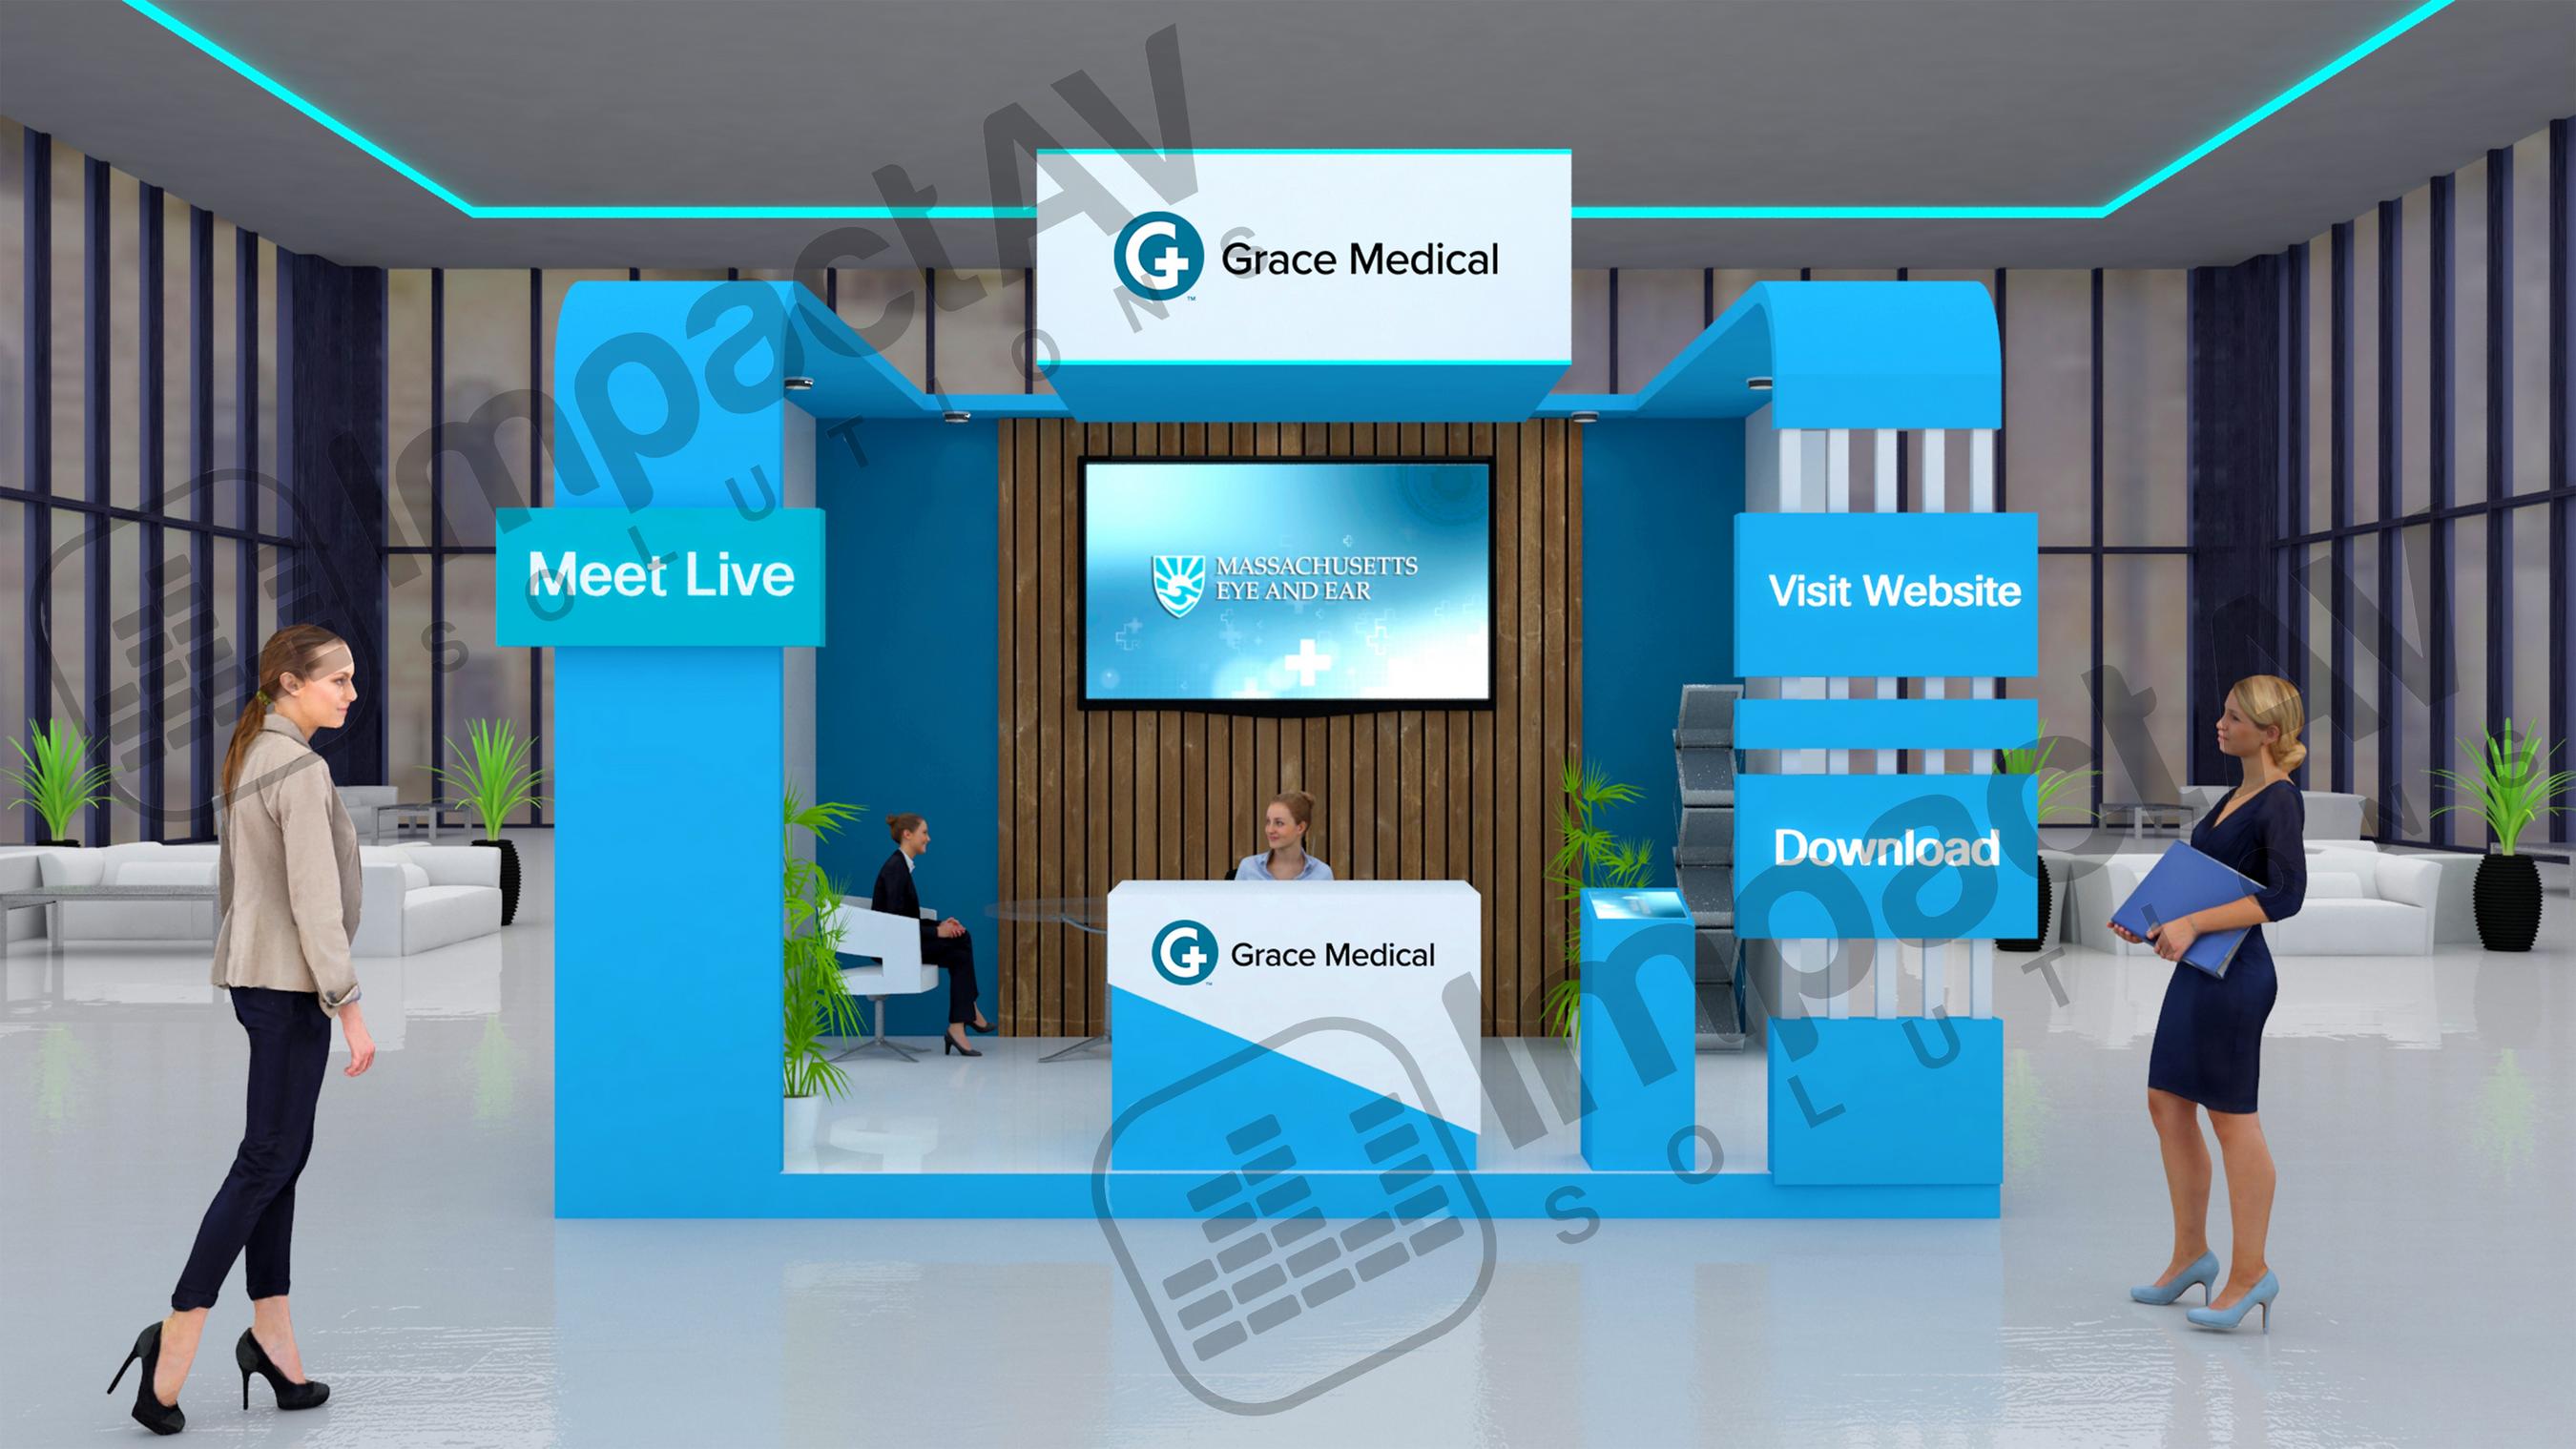 MEEI Grace Medical